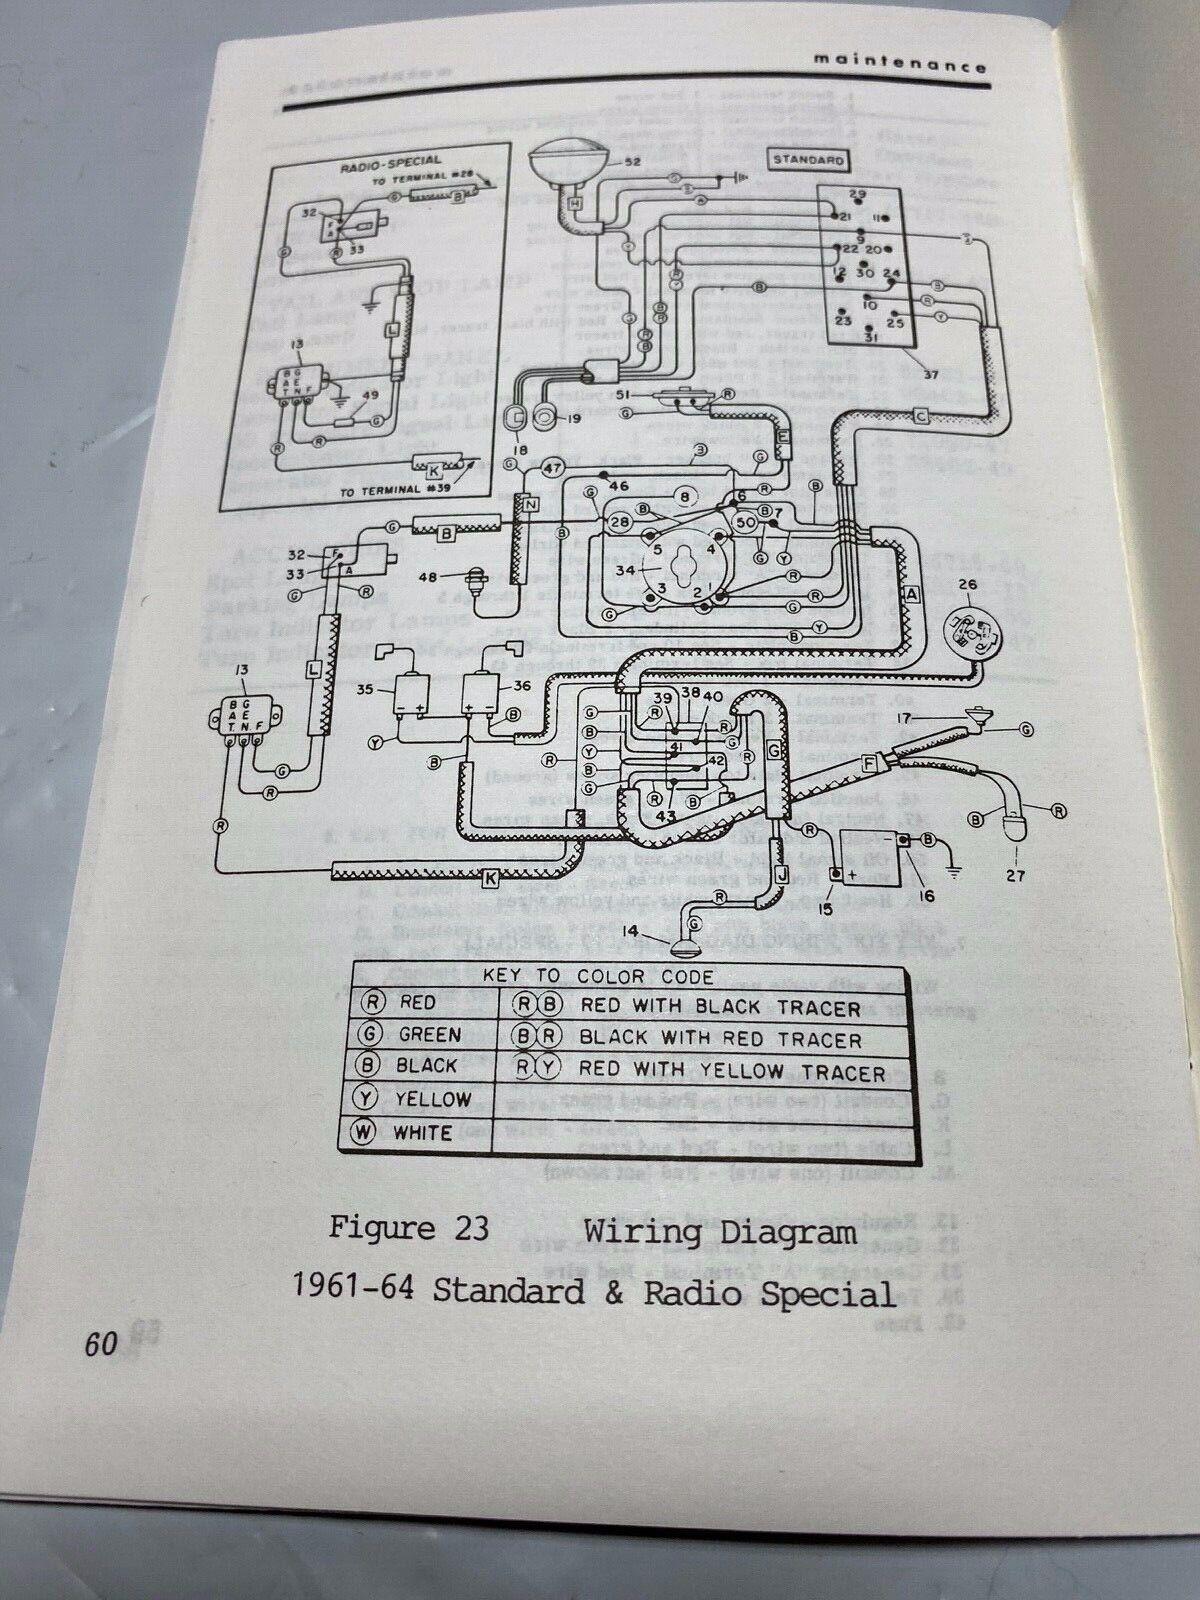 cycle electrics panhead wiring diagram harley rider s handbook owner s manual 1958 1964 duo glide panhead  manual 1958 1964 duo glide panhead